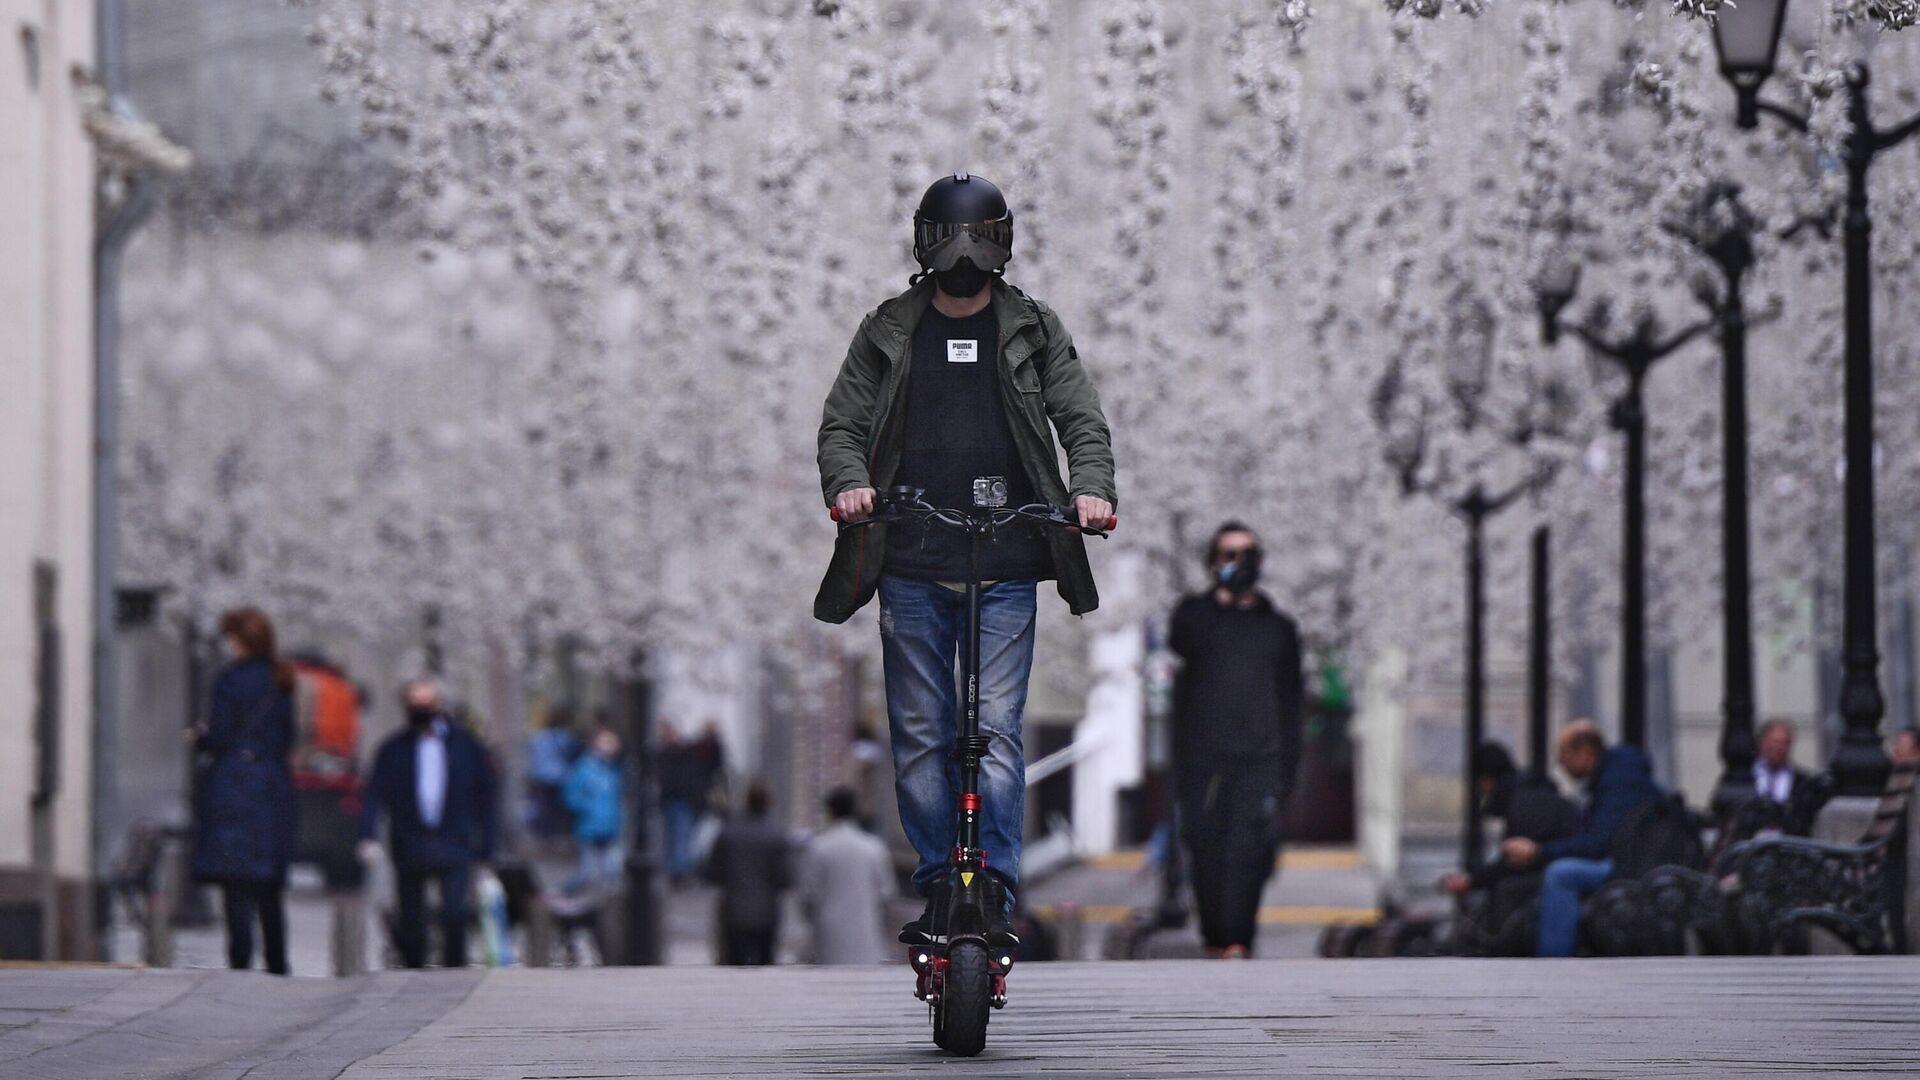 Мужчина в защитном шлеме катается на электросамокате - РИА Новости, 1920, 07.04.2021